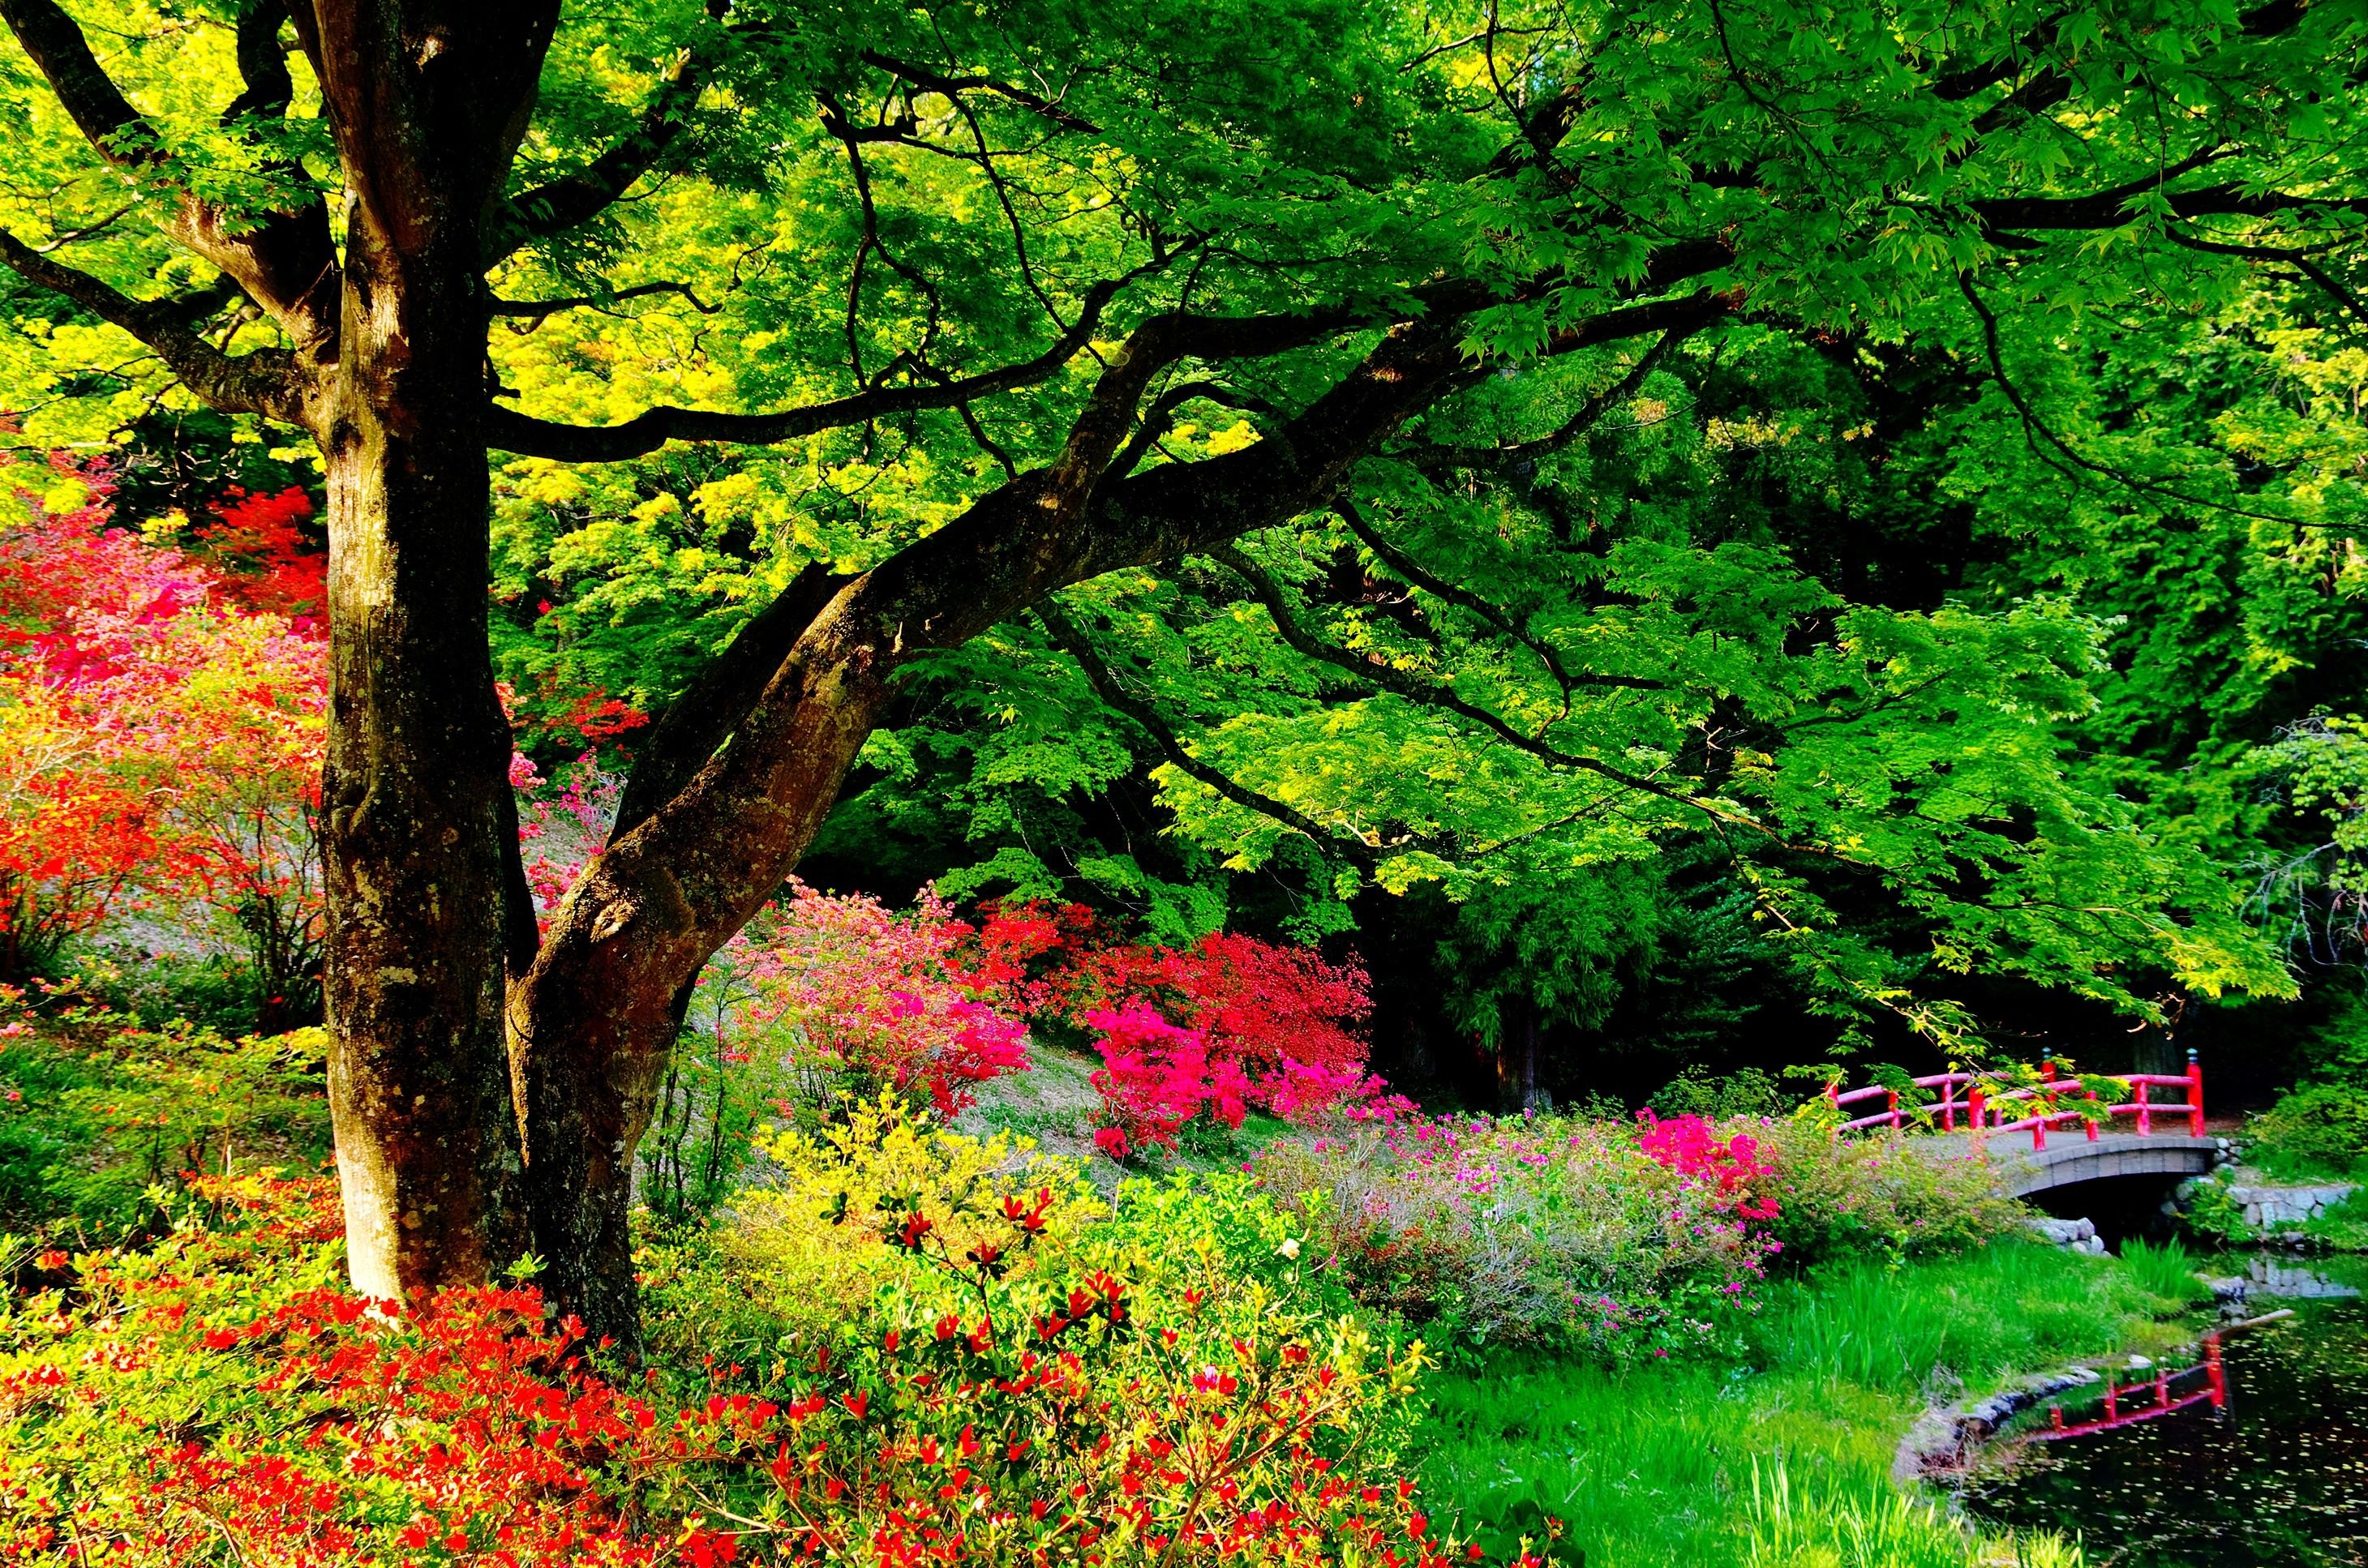 Japan Garden Flowers: Japanese Garden Wallpapers (65+ Images